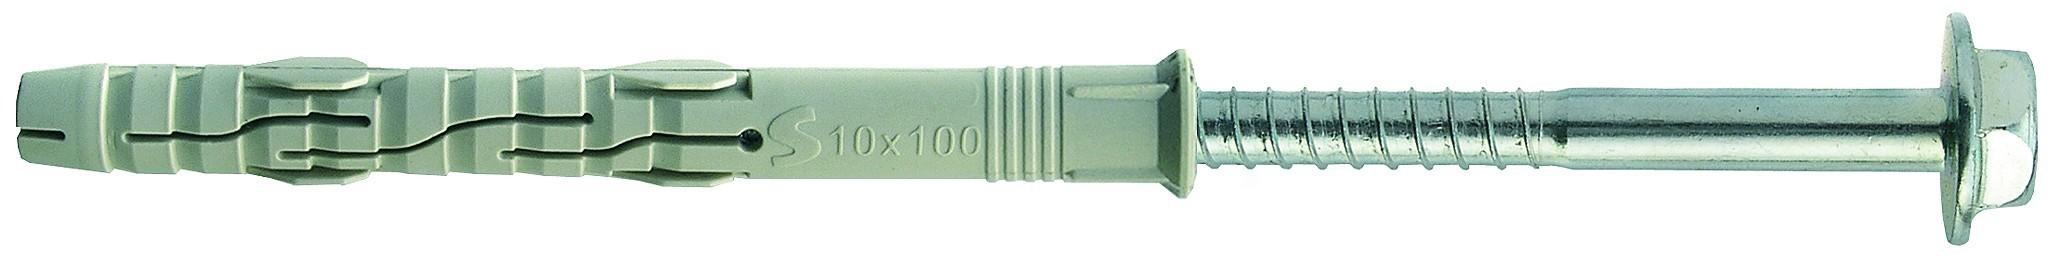 hmoždinka 10x80 RMST rámová + vrut 6hranná hlava s límcem torx, ETA-CE